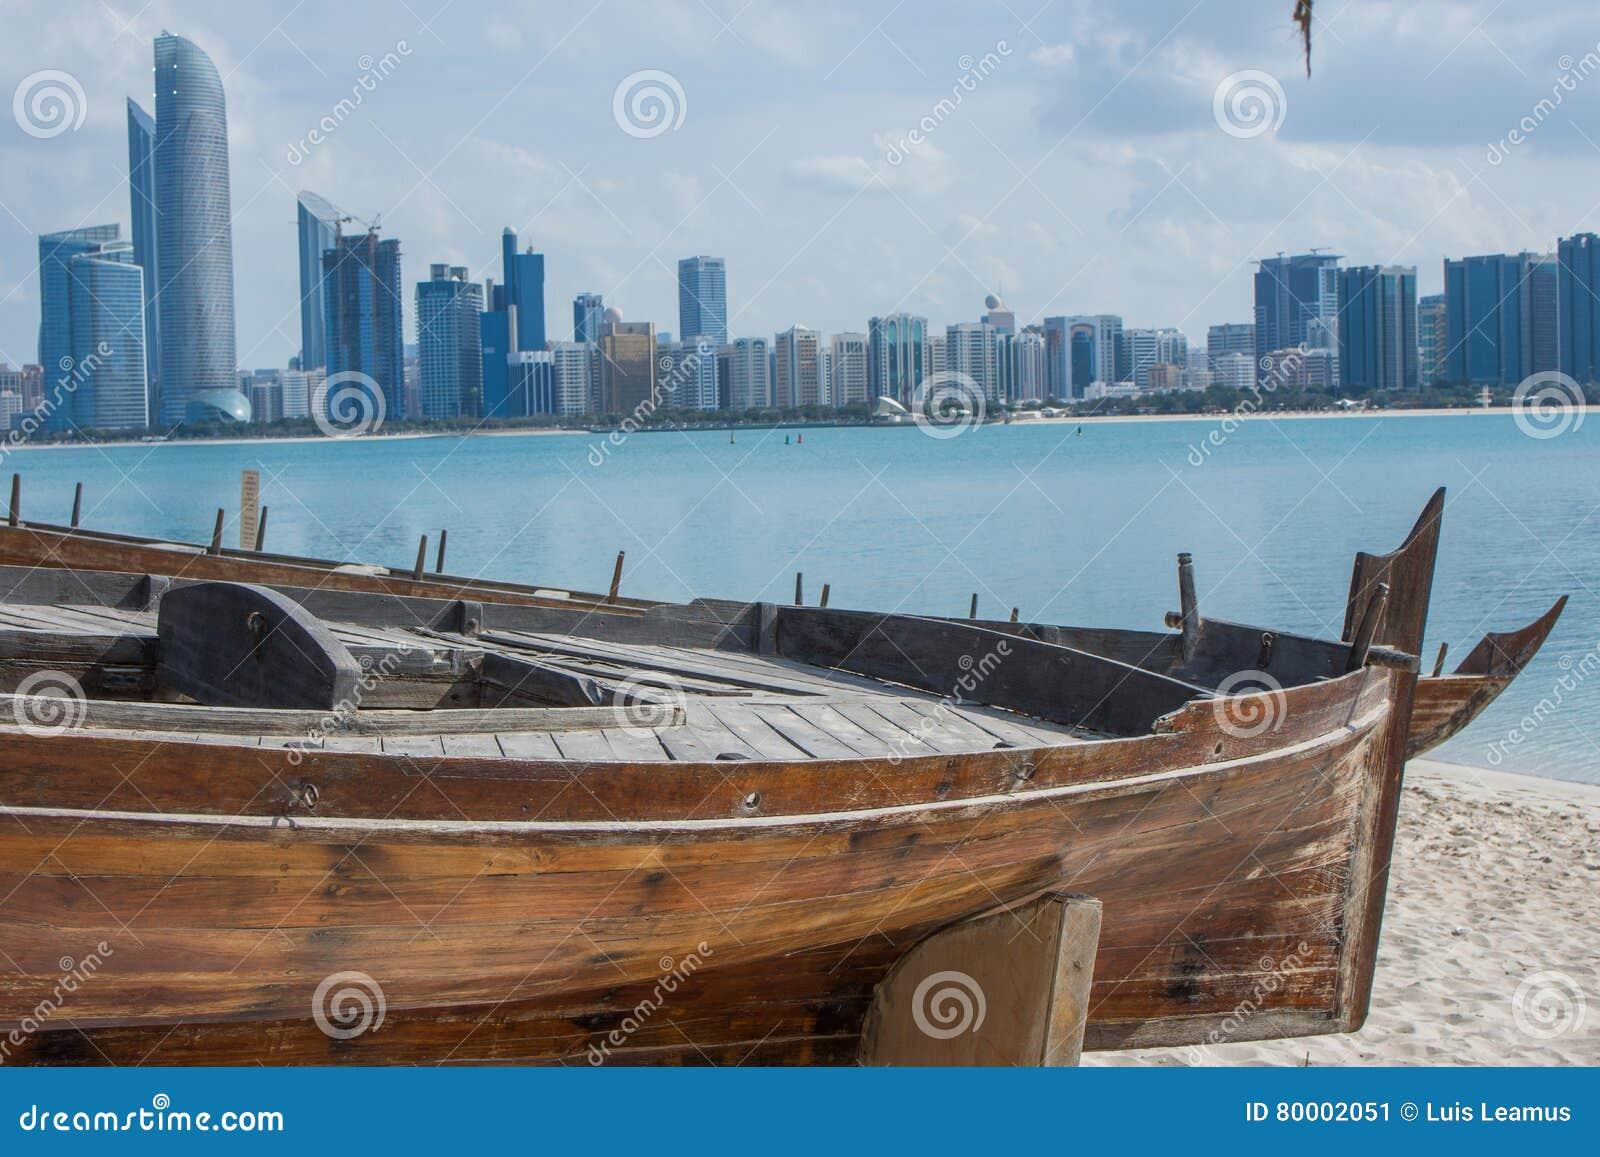 Abu Dhabi skyline from the Heritage Village, UAE